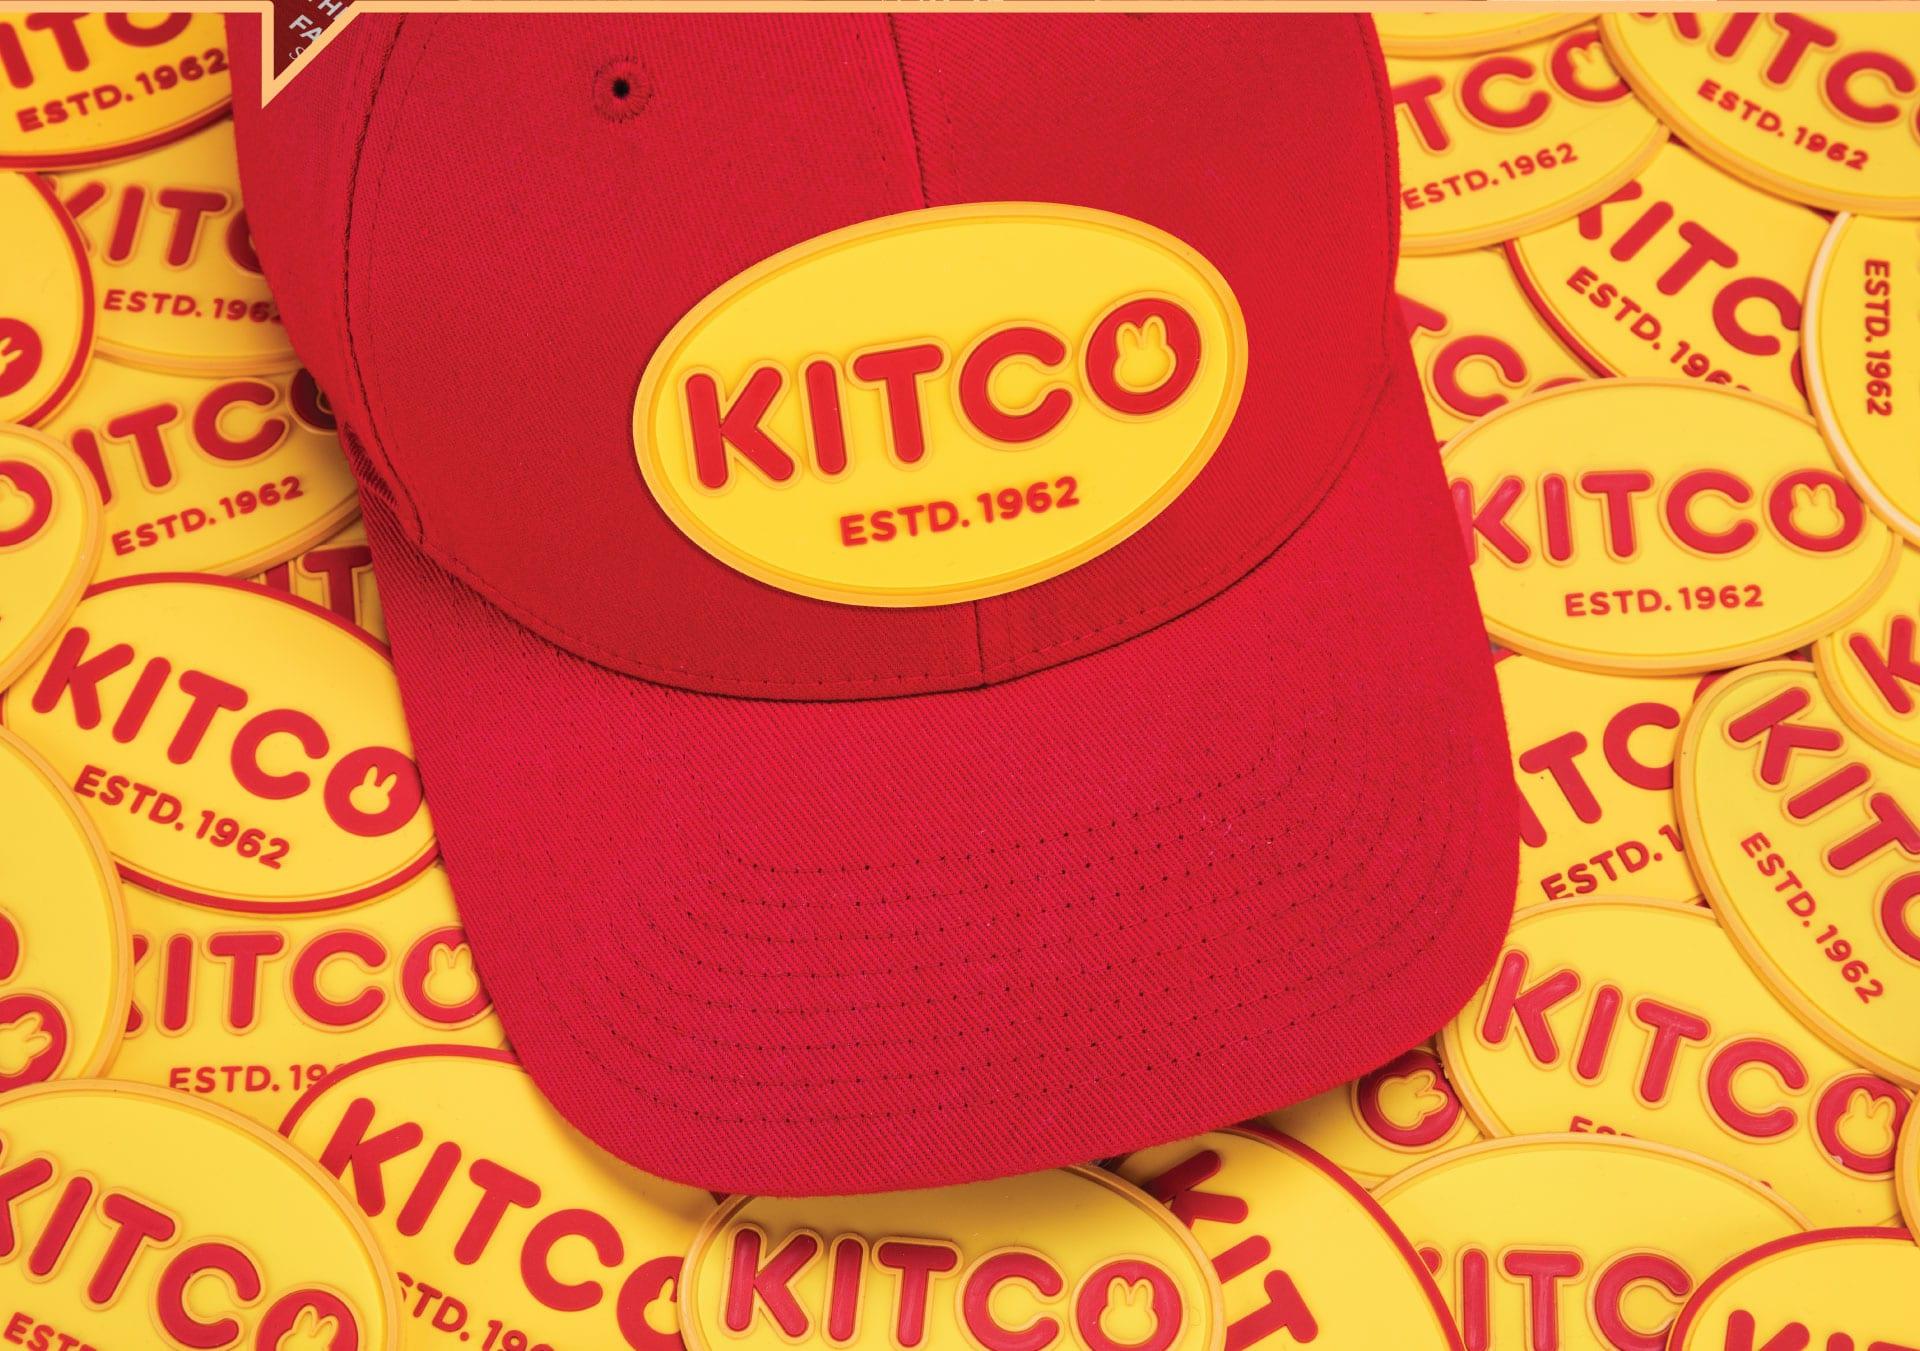 Kitco Masterbrand - Marketing Activation